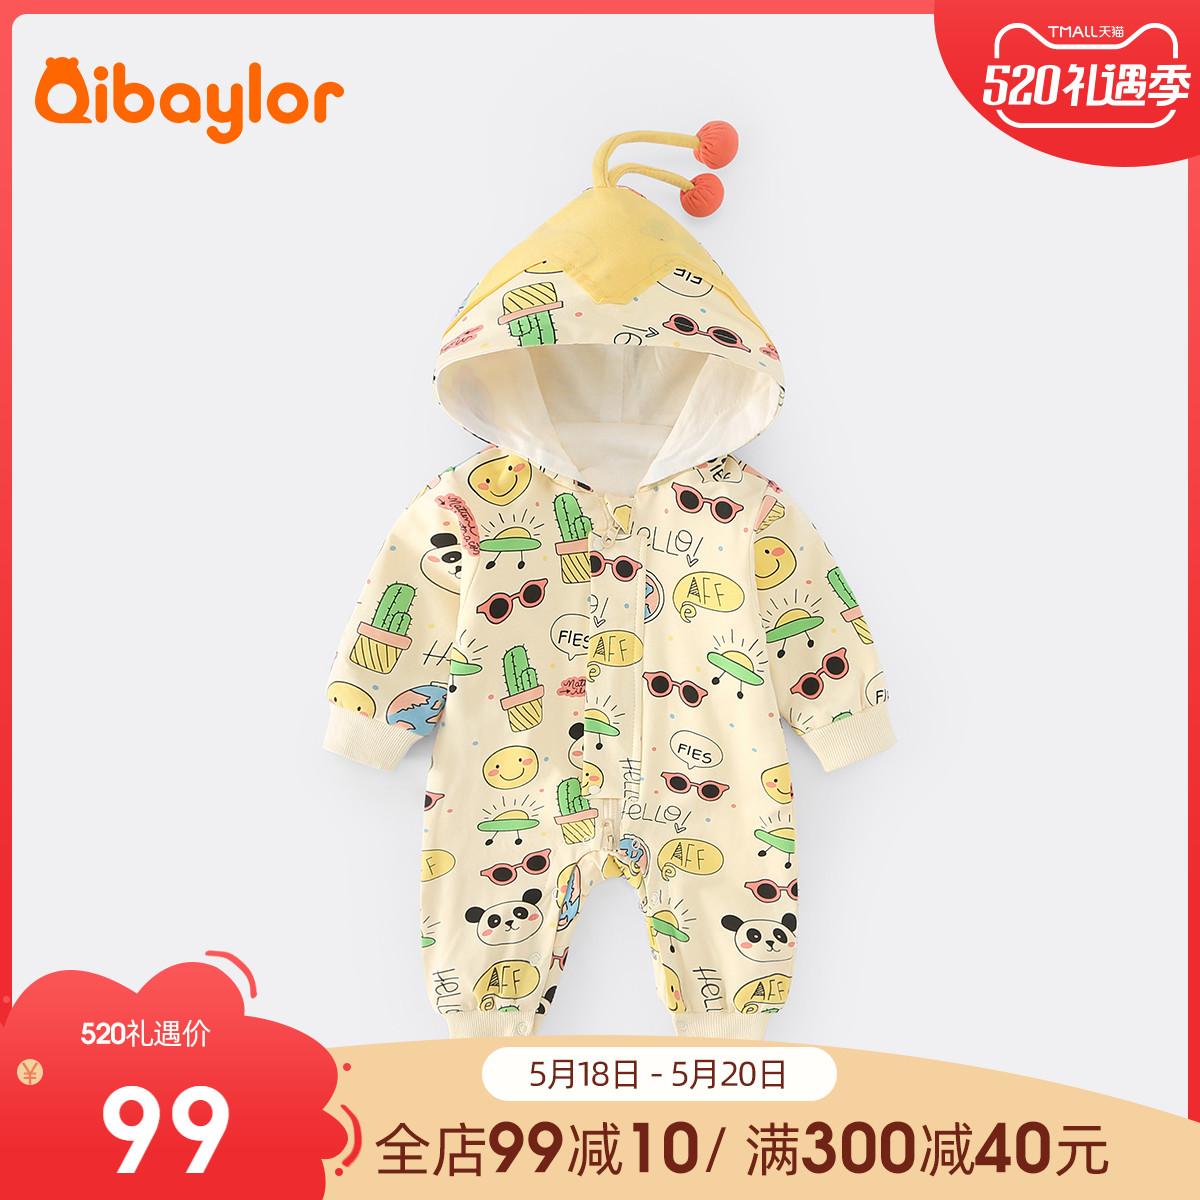 qibaylor婴儿连体衣服宝宝春秋冬装卡通可爱爬服婴幼儿保暖外套装